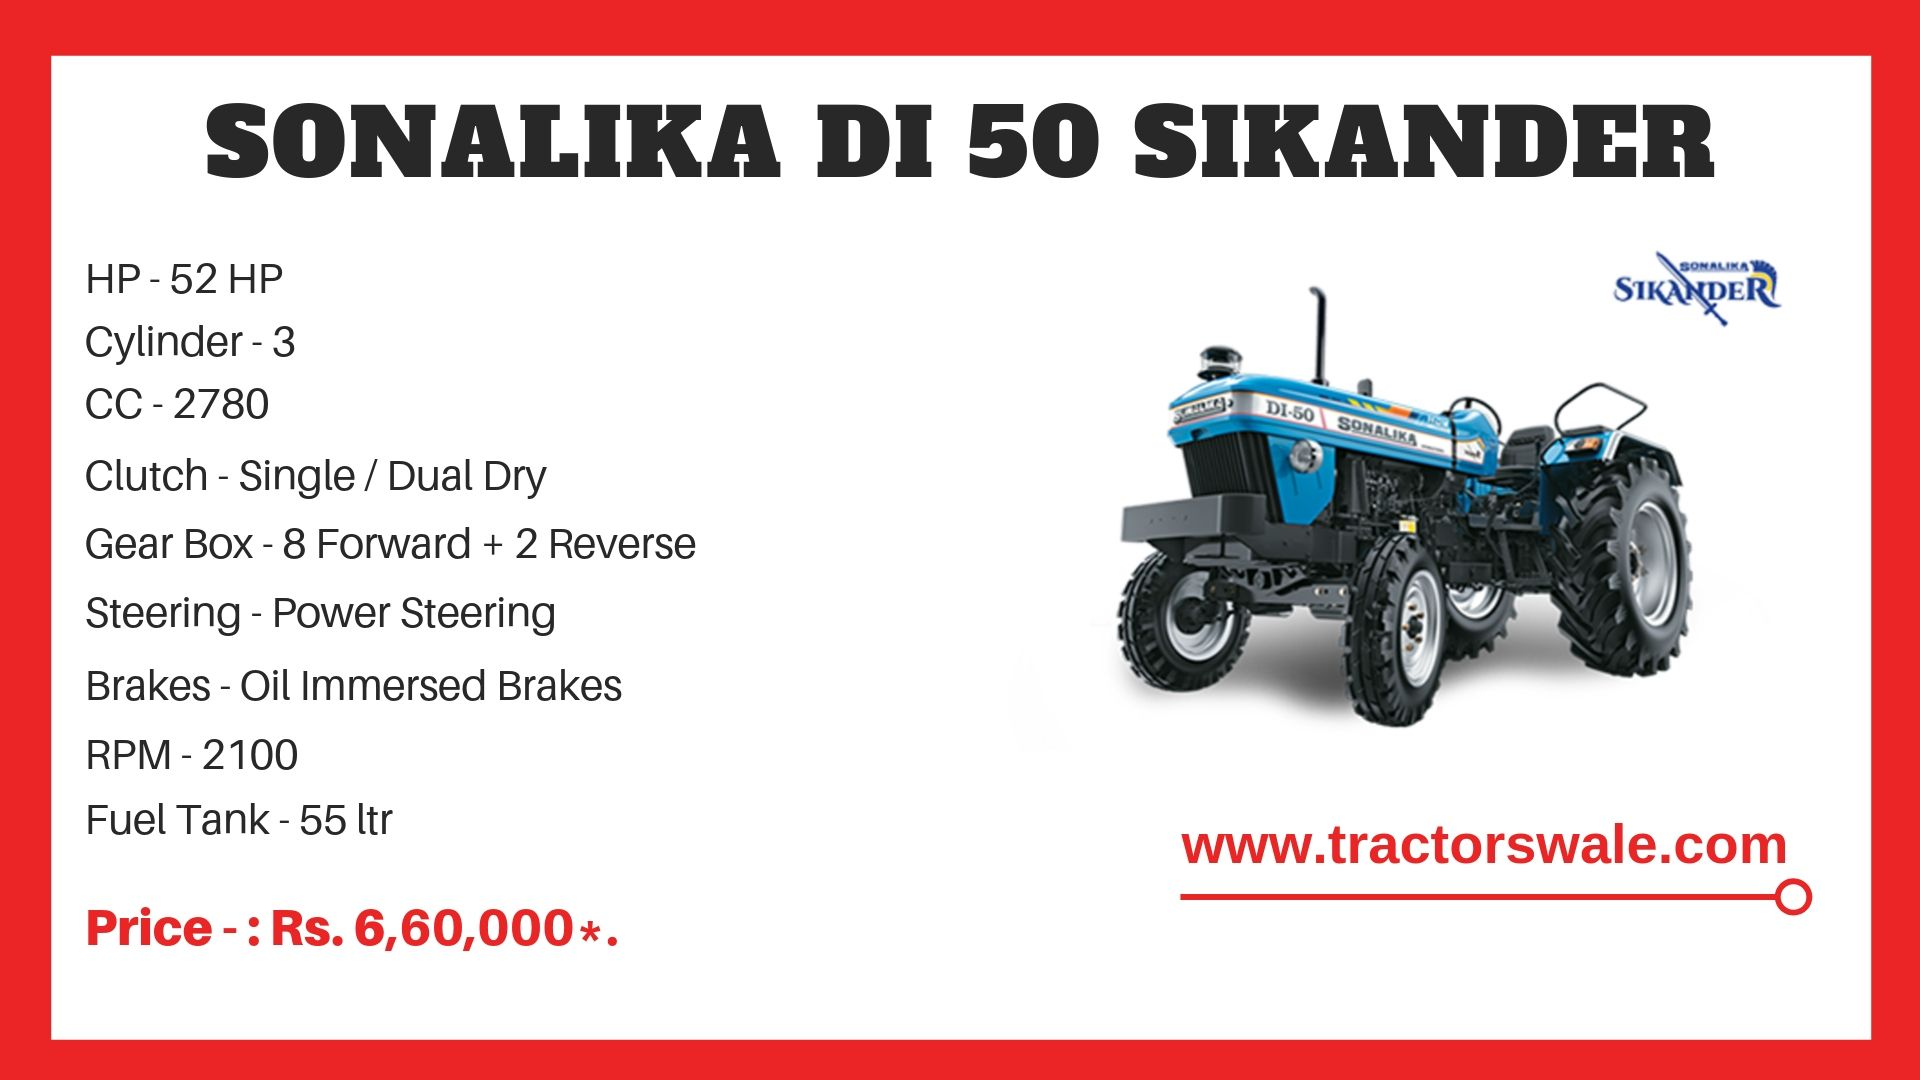 Sonalika DI 50 SIKANDER Tractor specs